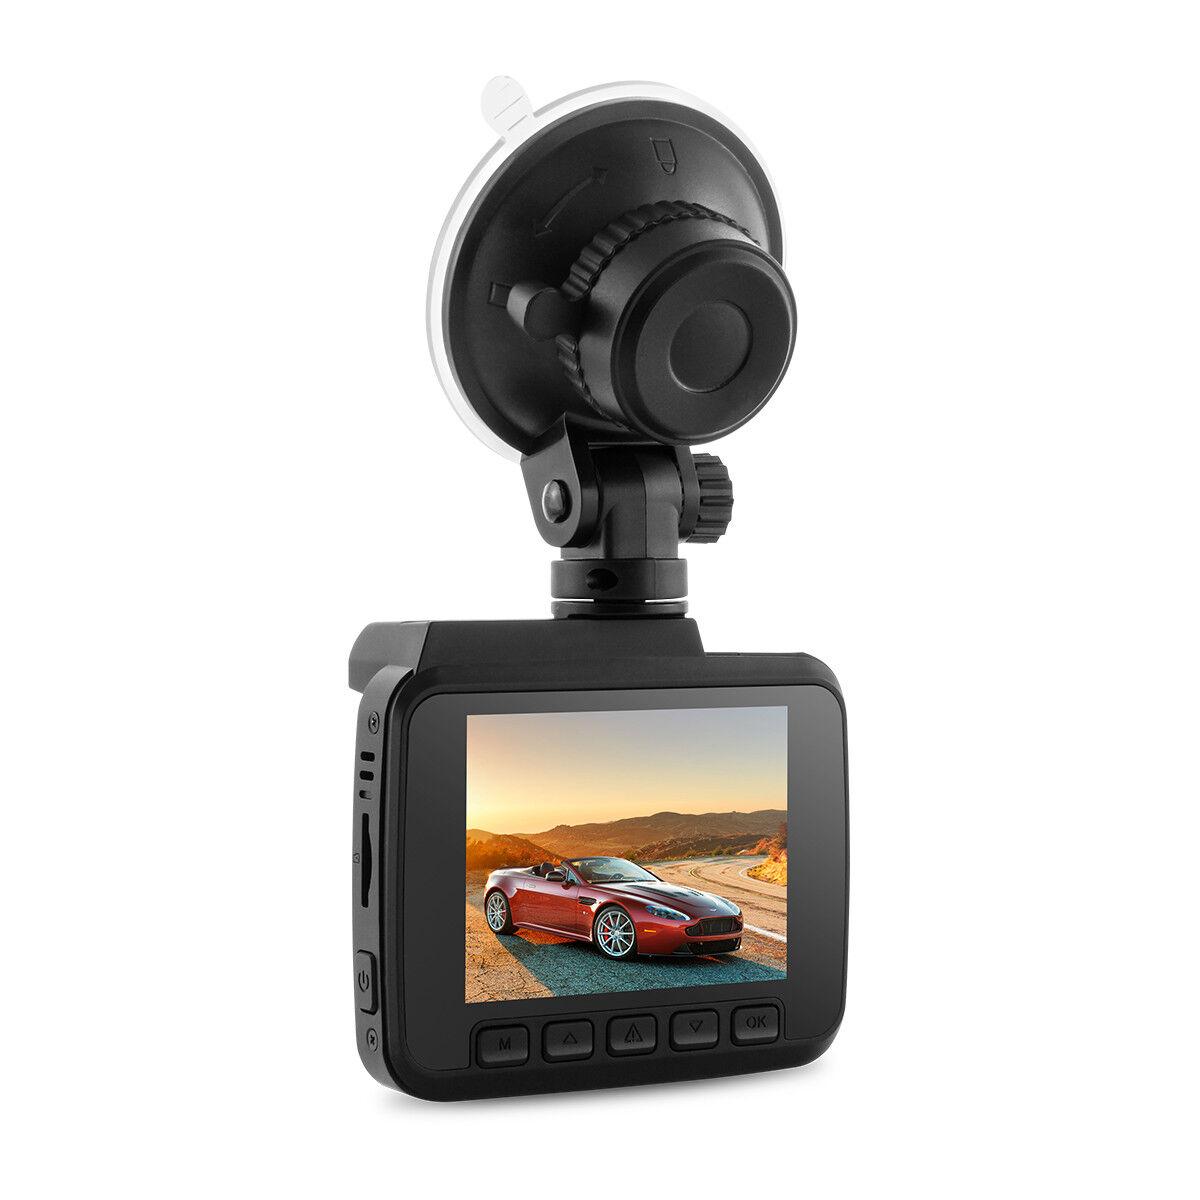 s-l1600 R2-4K Car Dash Cam - 4K Ultra HD 2160P - Built-In WiFi & GPS, Parking Mode